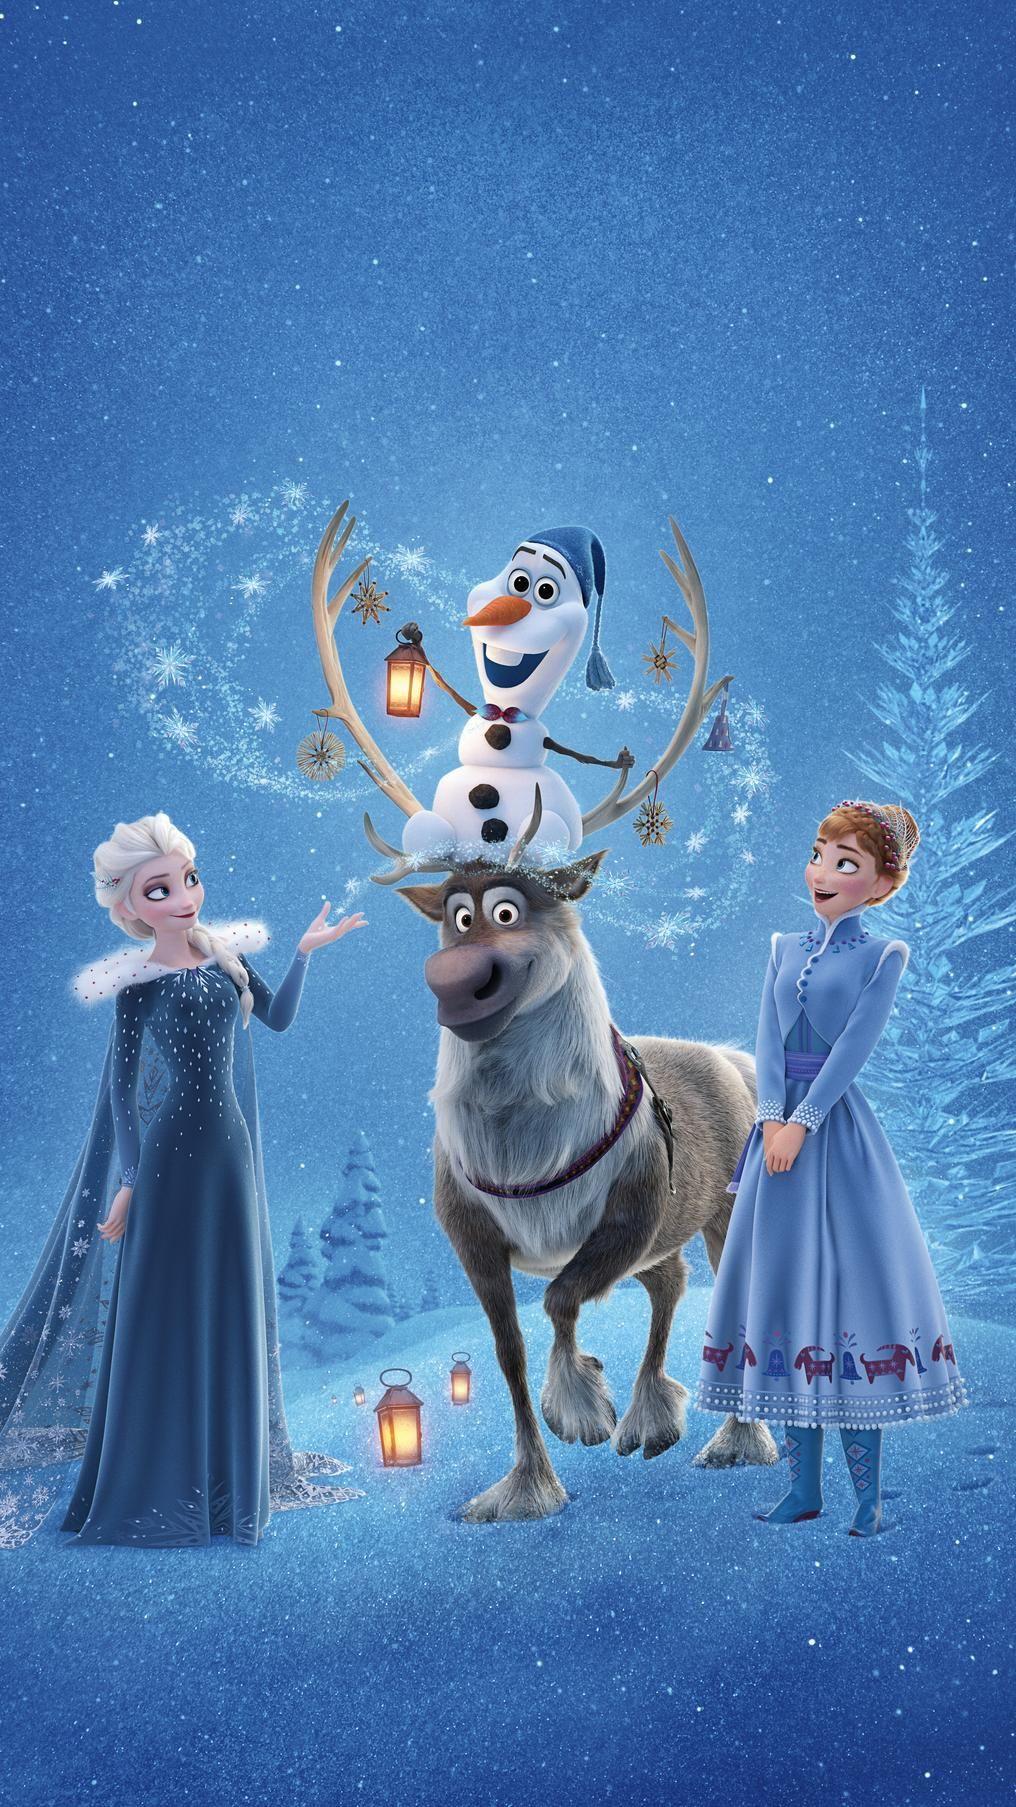 Olaf's Frozen Adventure (2017) Phone Wallpaper in 2020